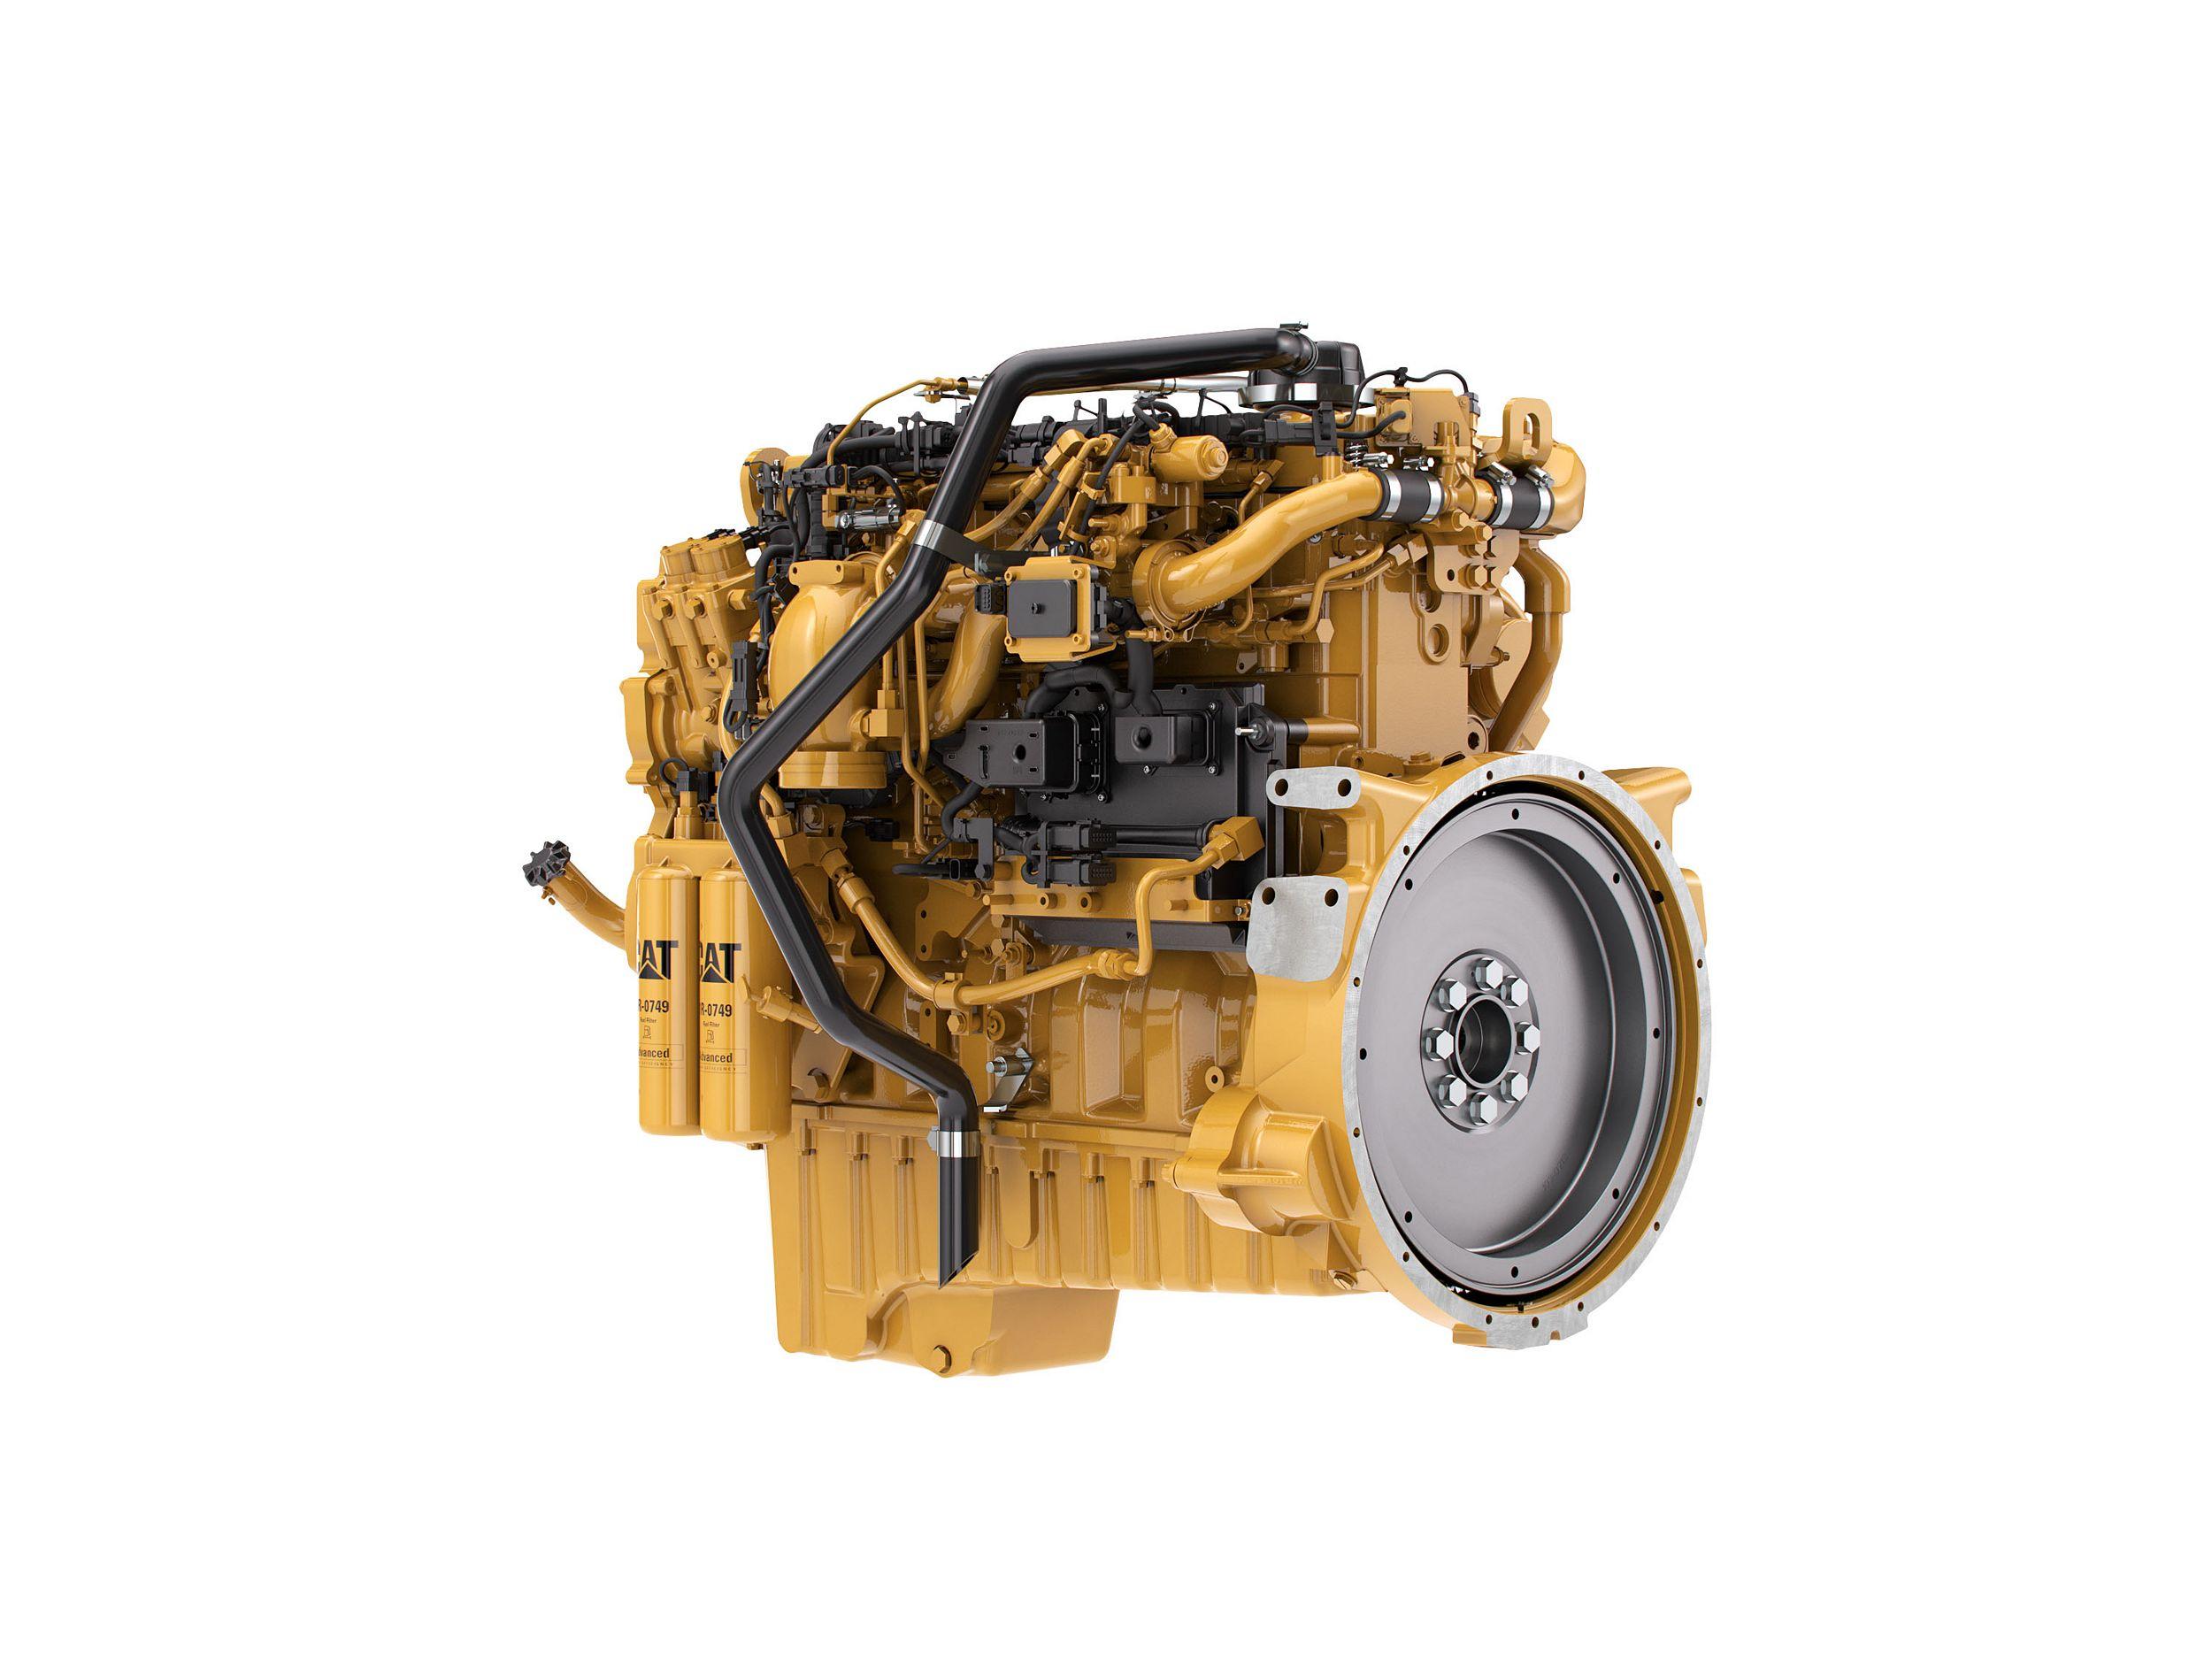 C9.3 Tier 4 Diesel Engines – Highly Regulated